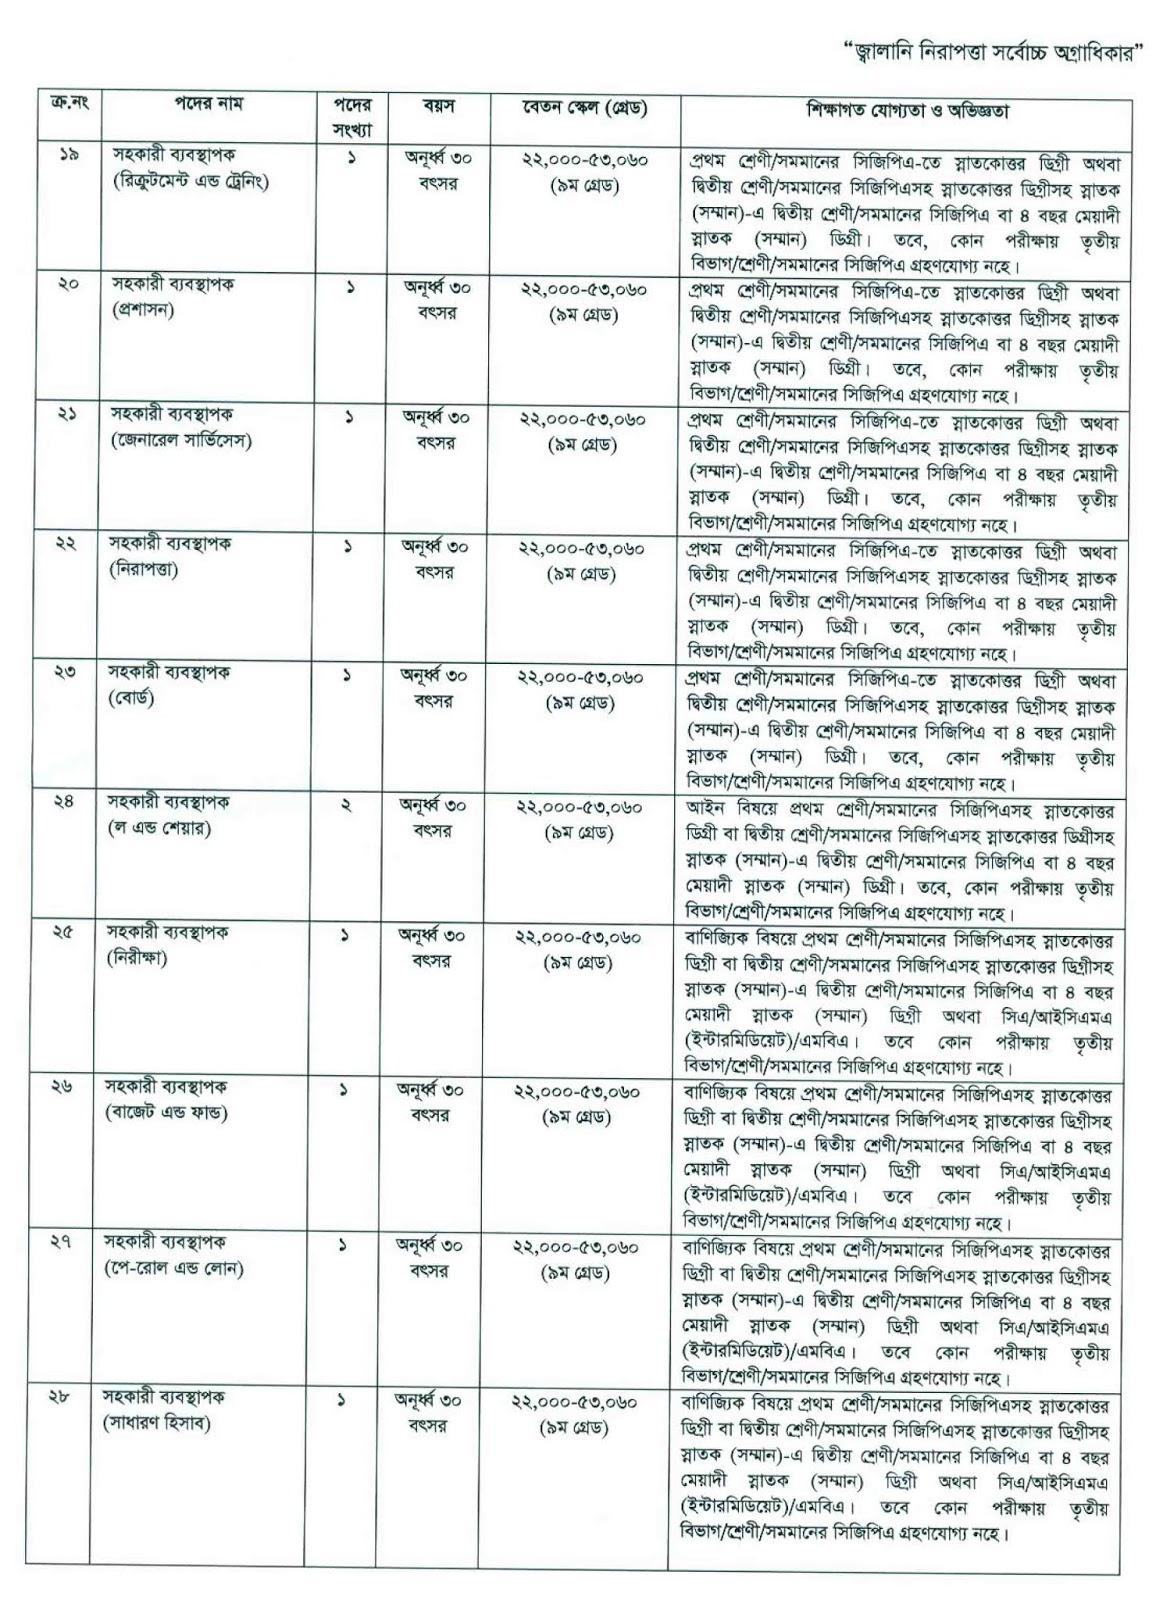 Barapukuria Coal Mining Company Limited Job Circular 2018